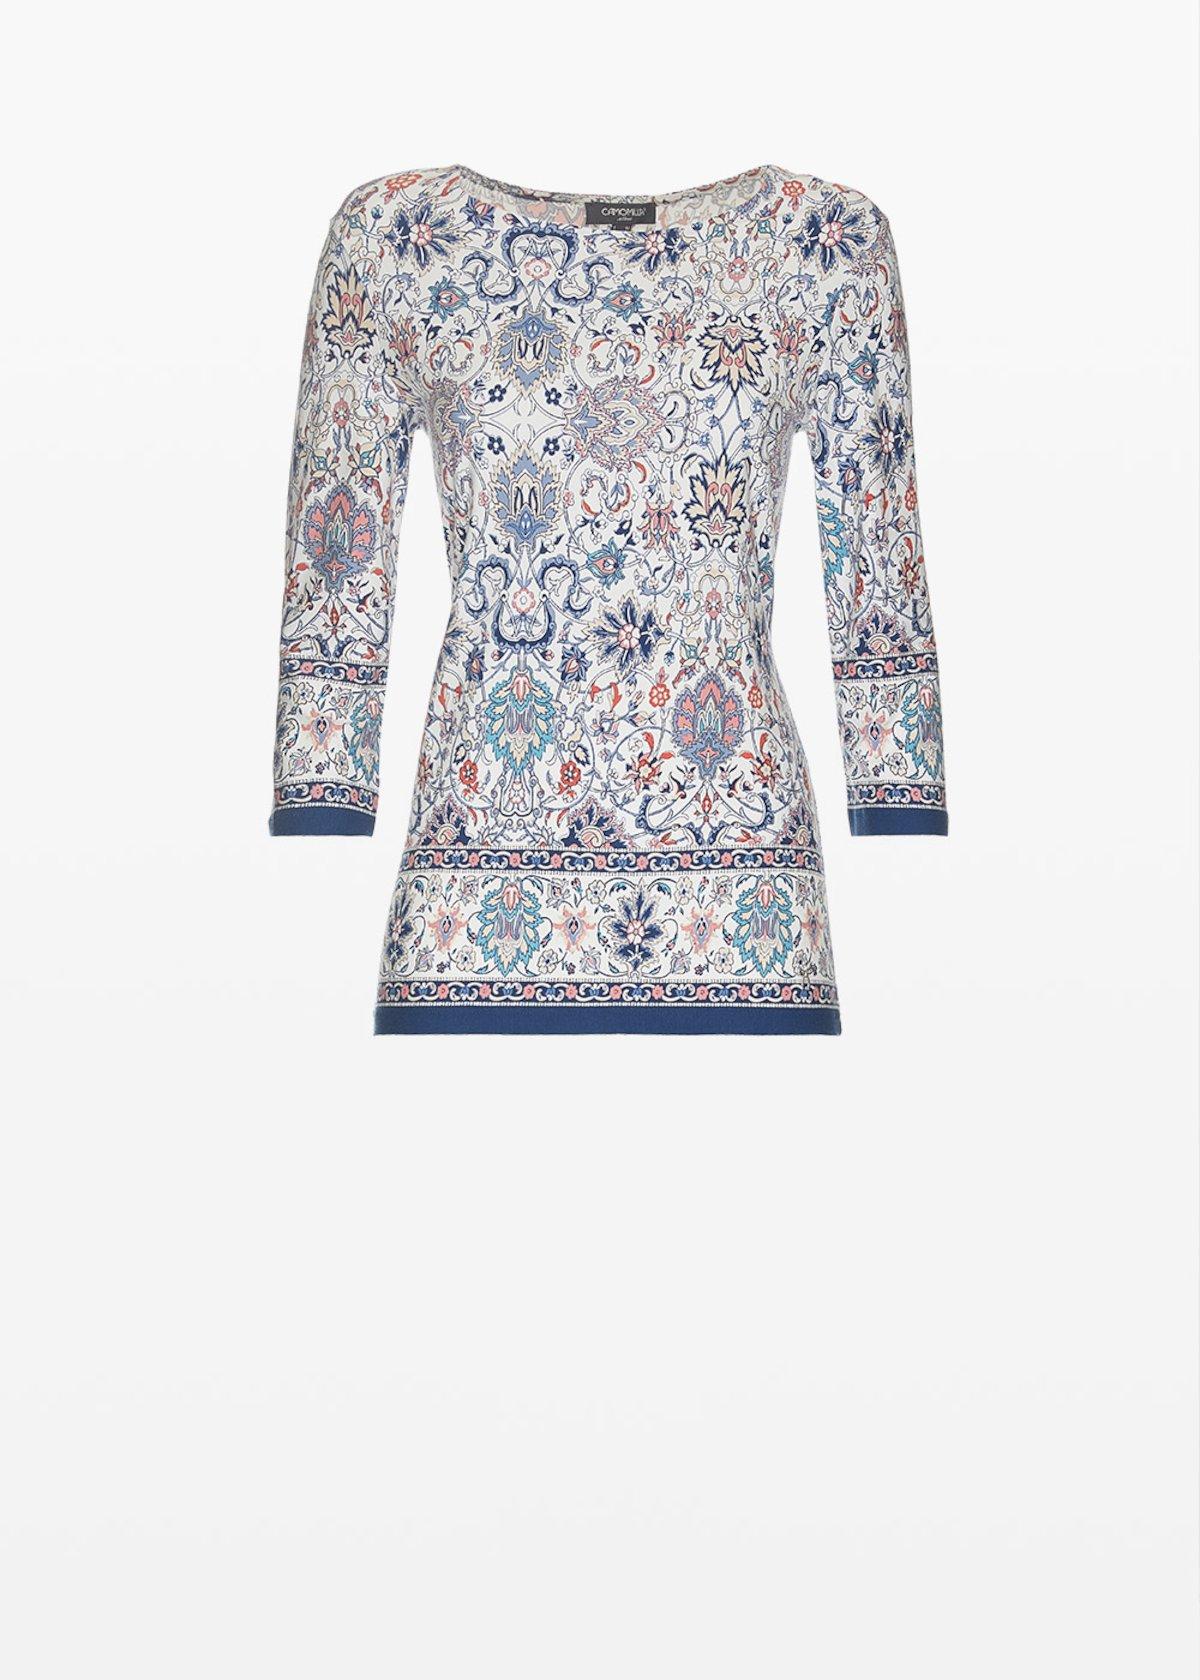 Semyl all over printed t-shirt - White / Blue Fantasia - Woman